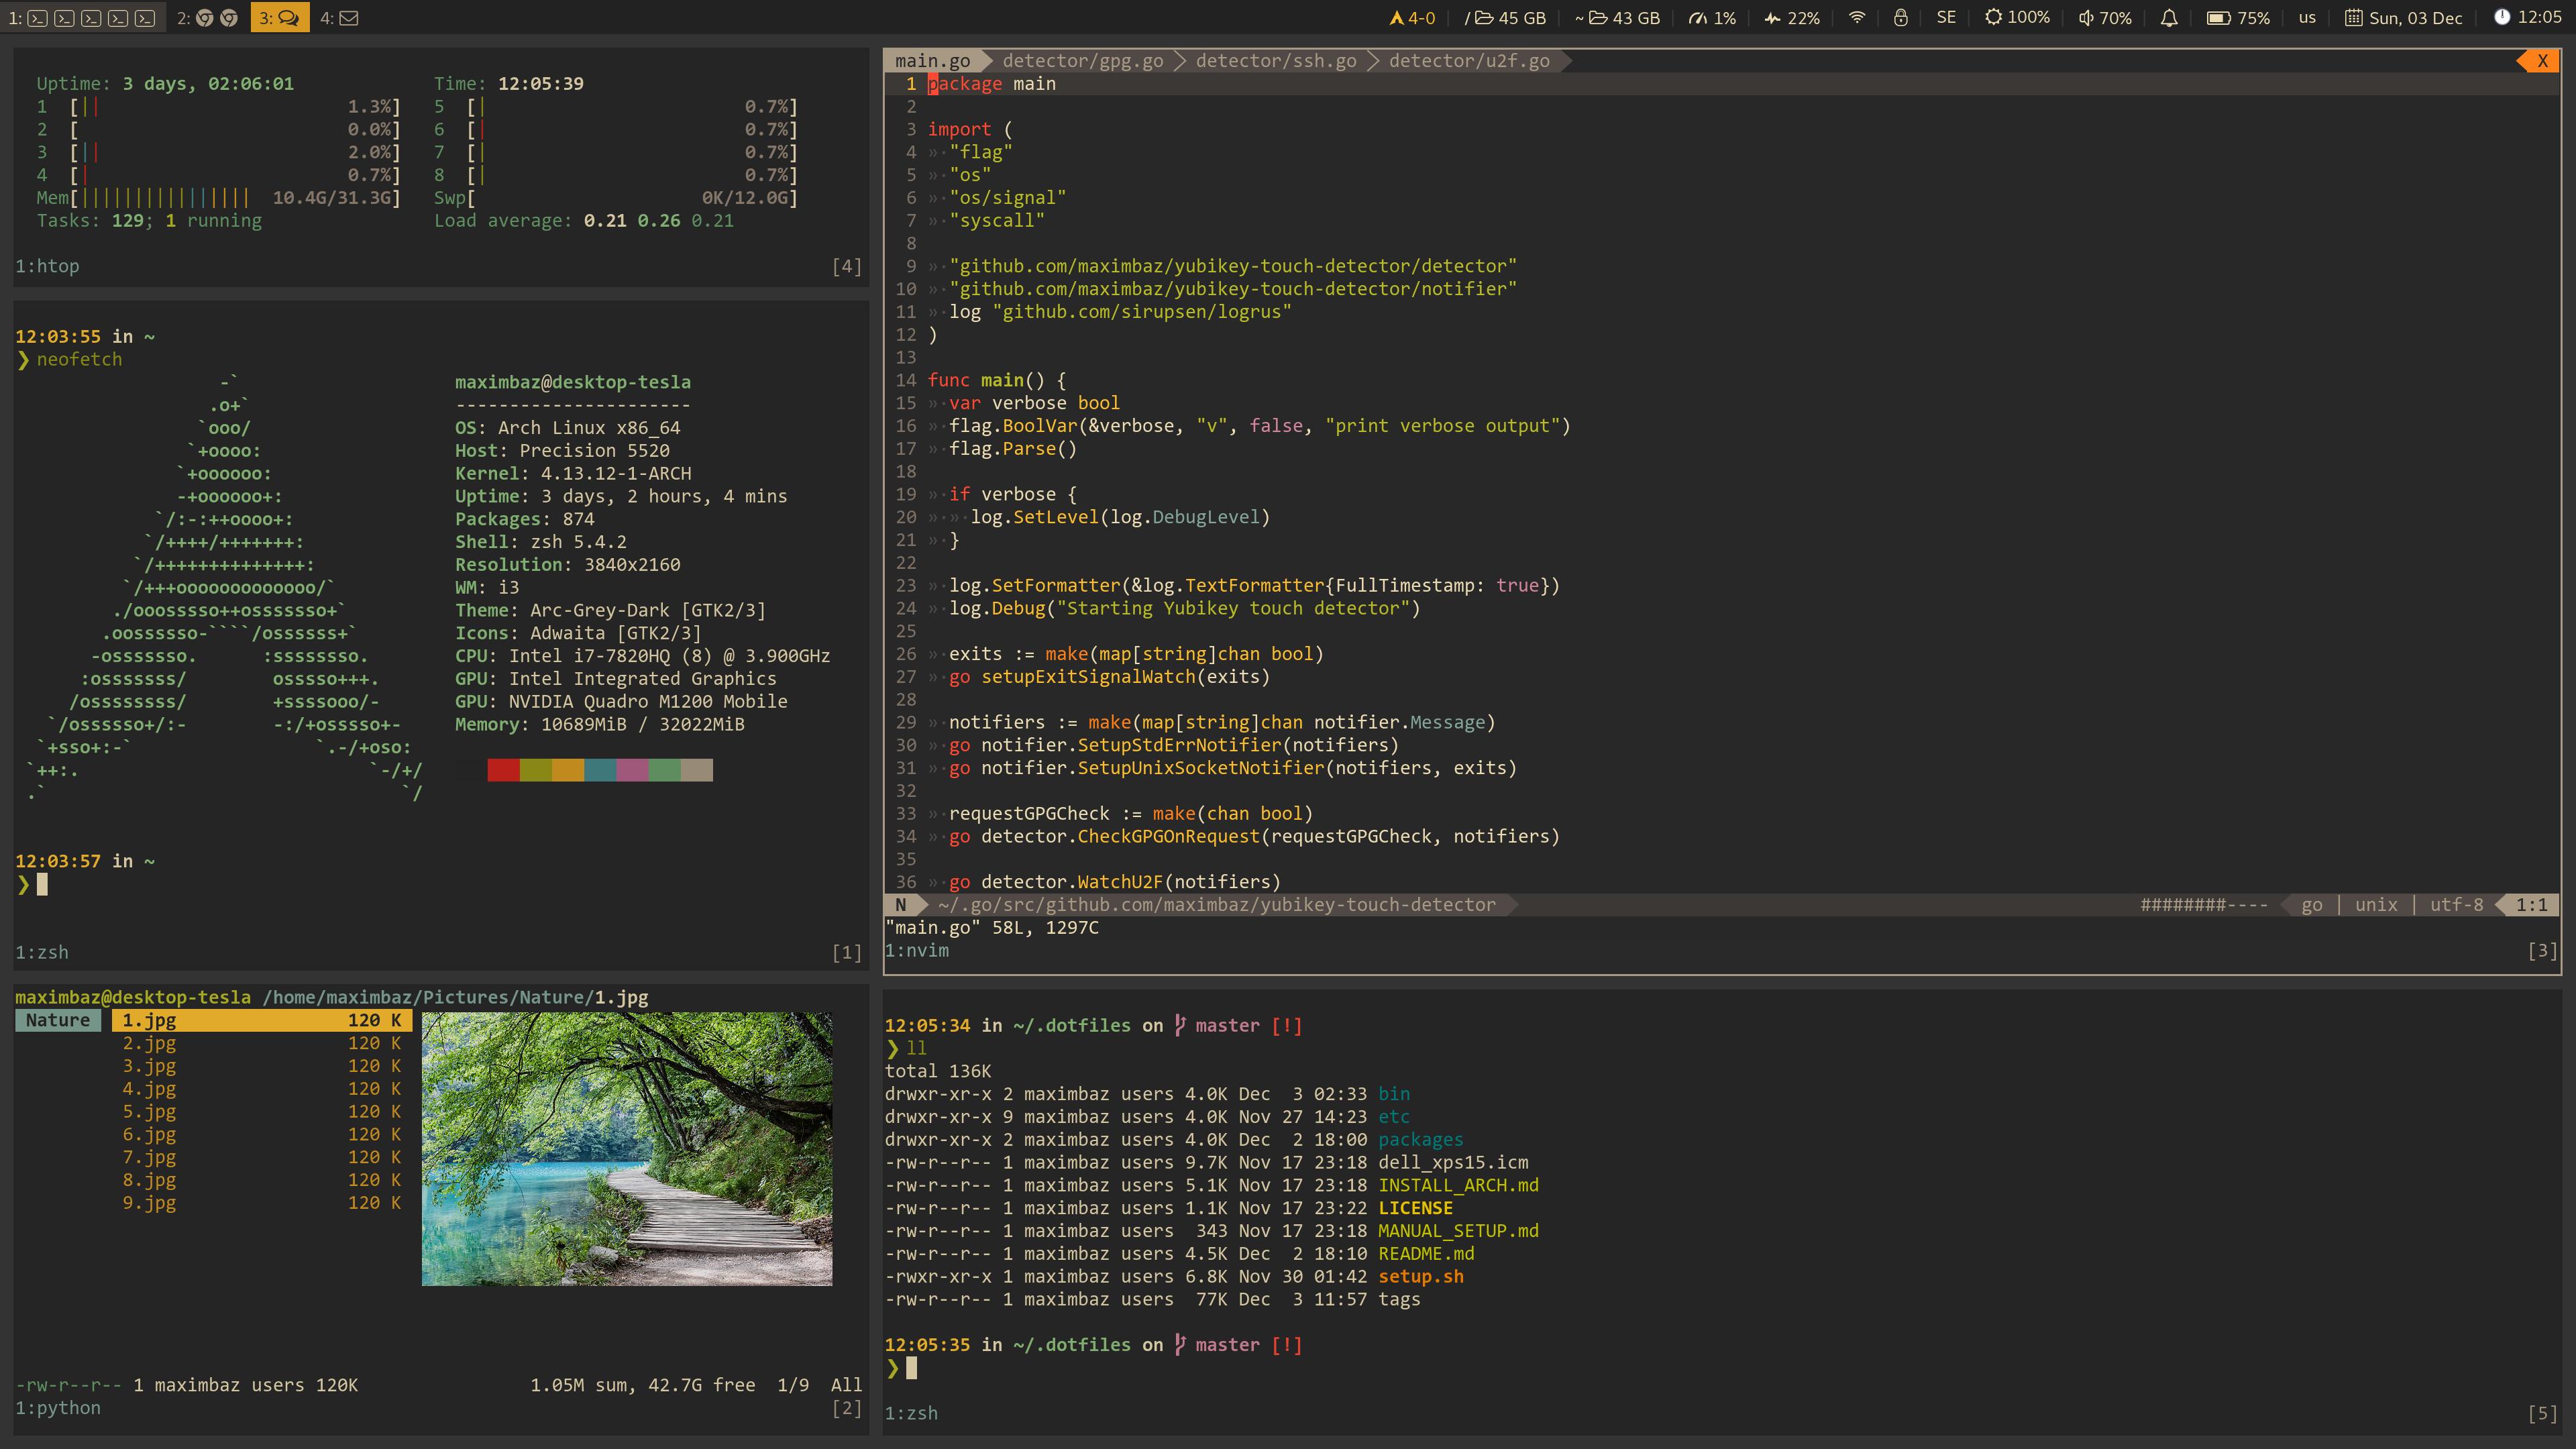 manjaro linux install i3